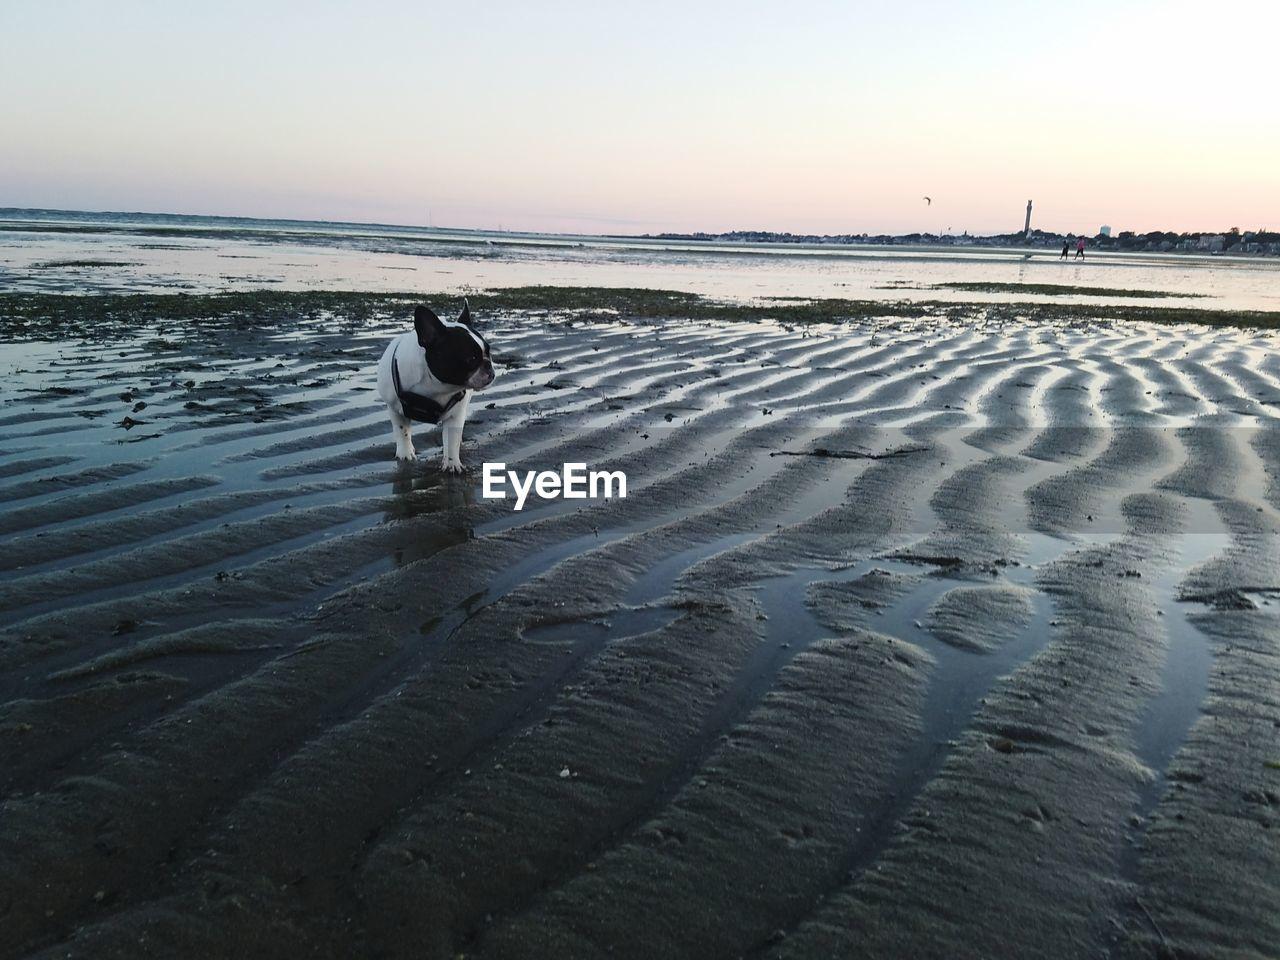 sky, land, beach, sunset, water, animal, beauty in nature, animal themes, one animal, vertebrate, nature, sand, scenics - nature, tranquility, sea, animal wildlife, bird, no people, non-urban scene